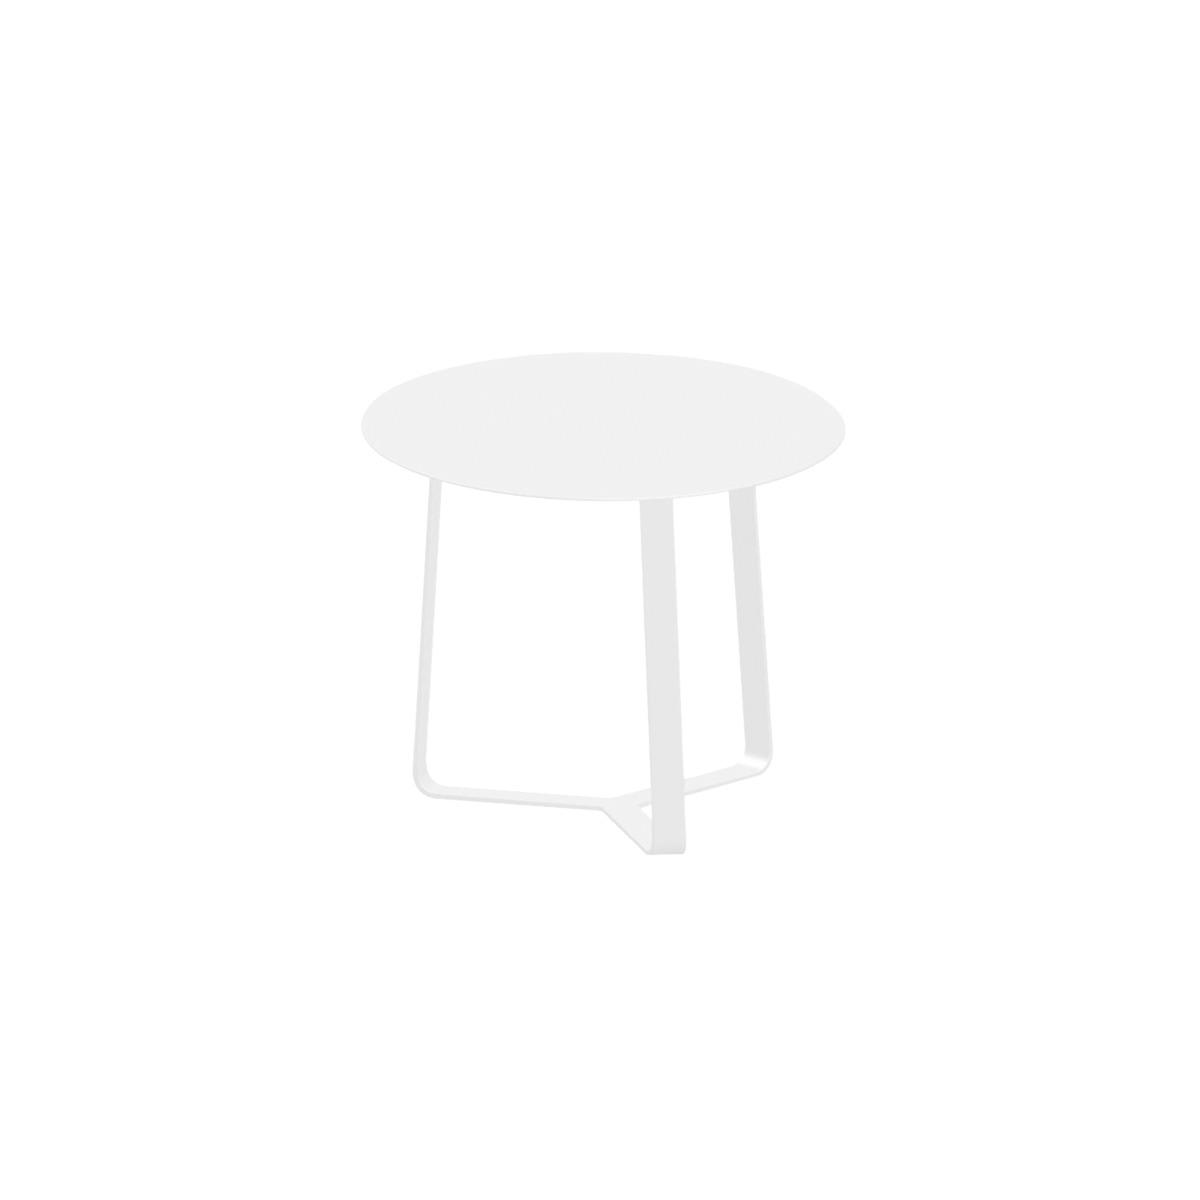 Apollo Aluminium Side Table in White